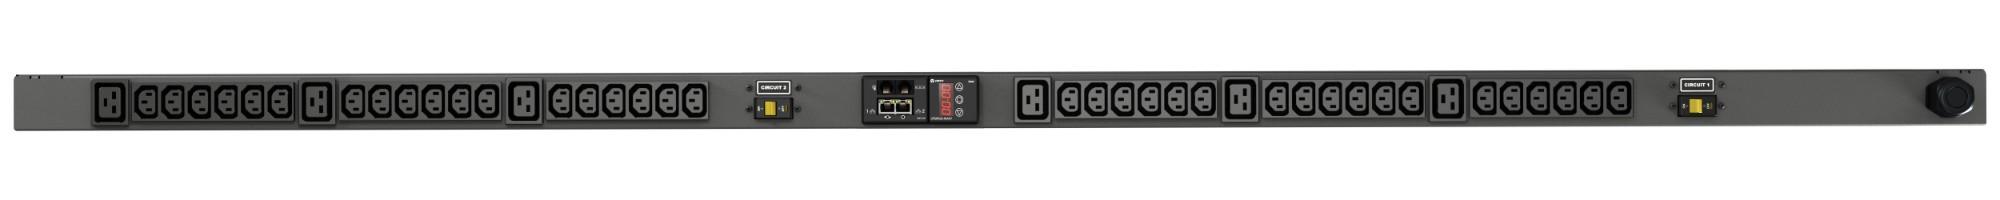 Vertiv Geist rPDU, monitored, 0U, input IEC60309 230V 32A, outputs (36)C13 | (6)C19 unidad de distribución de energía (PDU) Negro 42 salidas AC